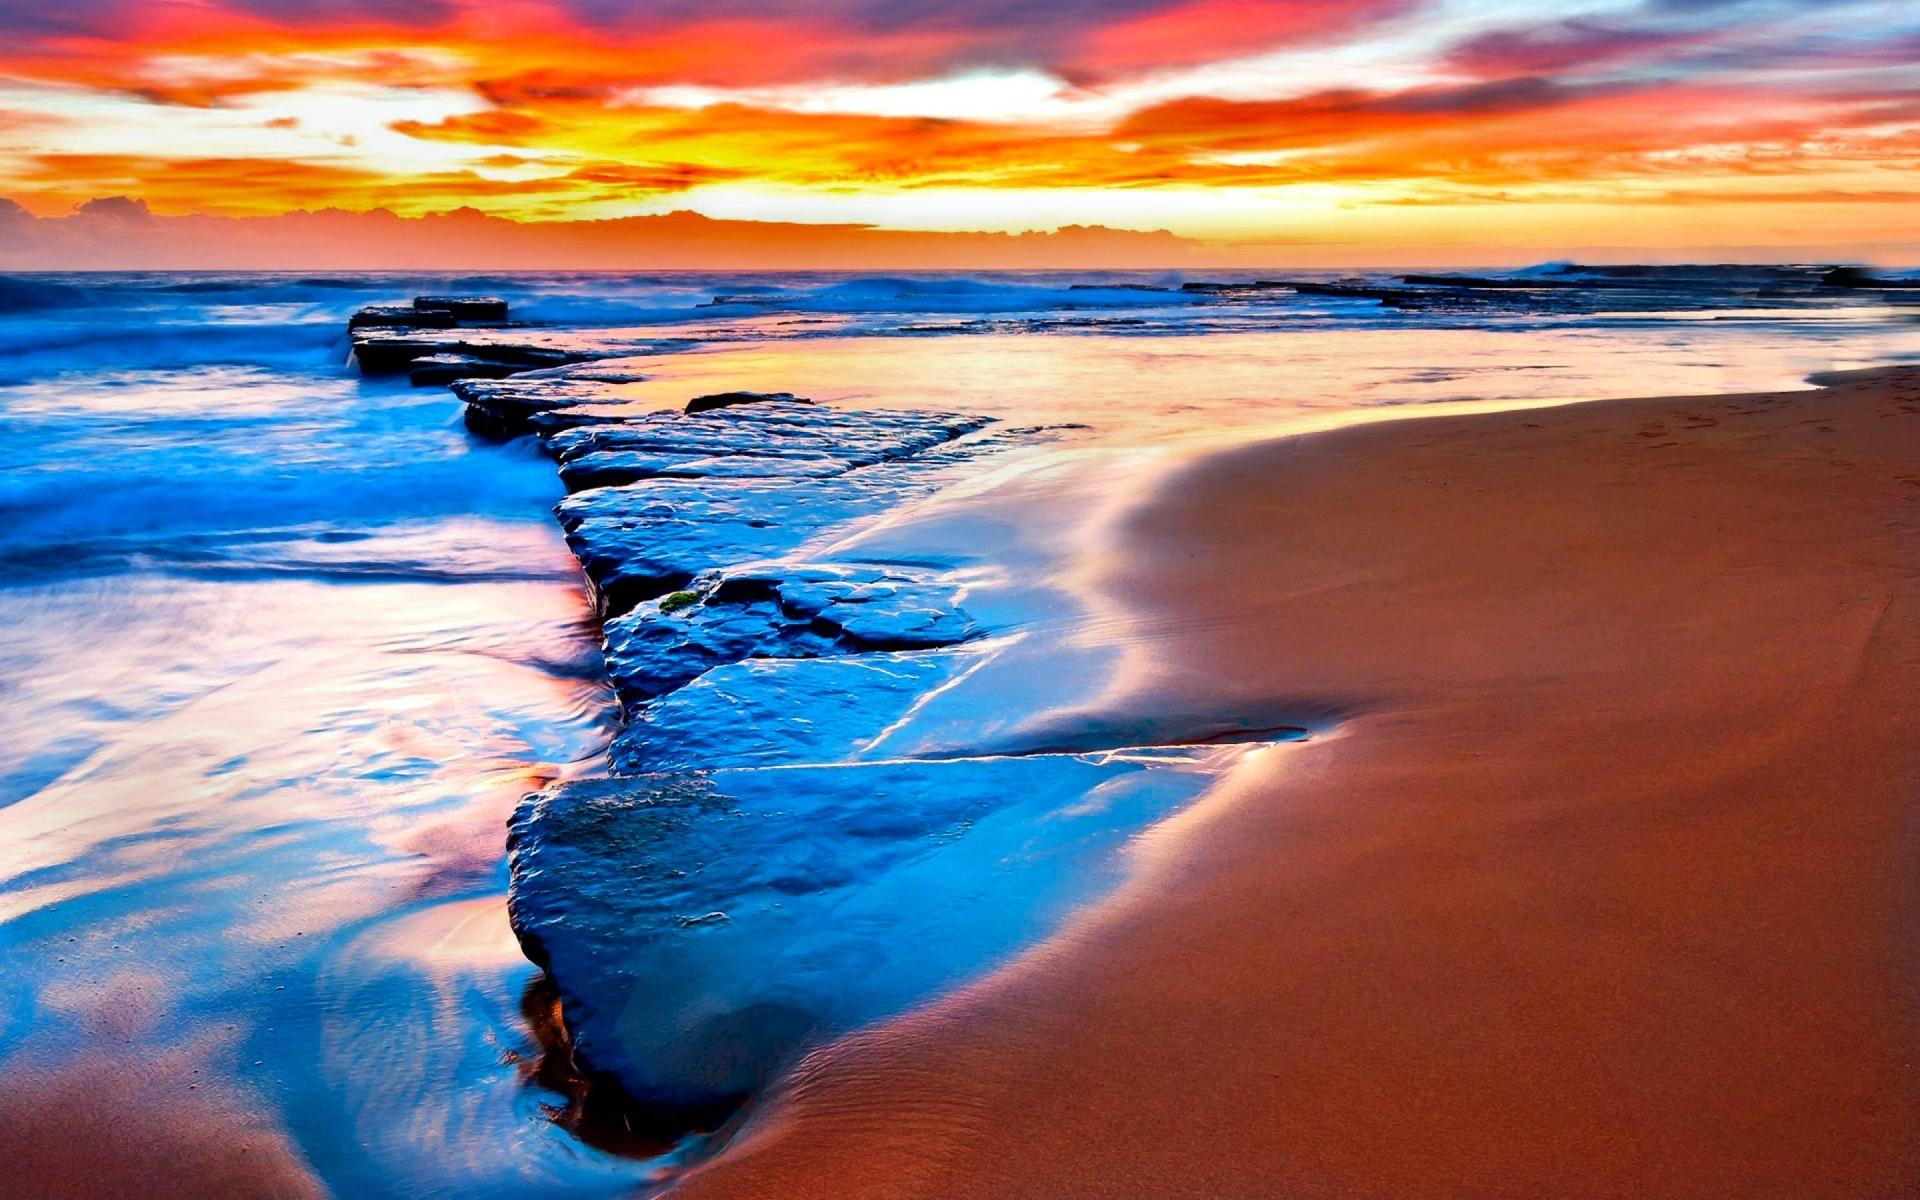 Wallpapers En Hd: Fondos De Pantalla De Playas, Wallpapers Beach Gratis